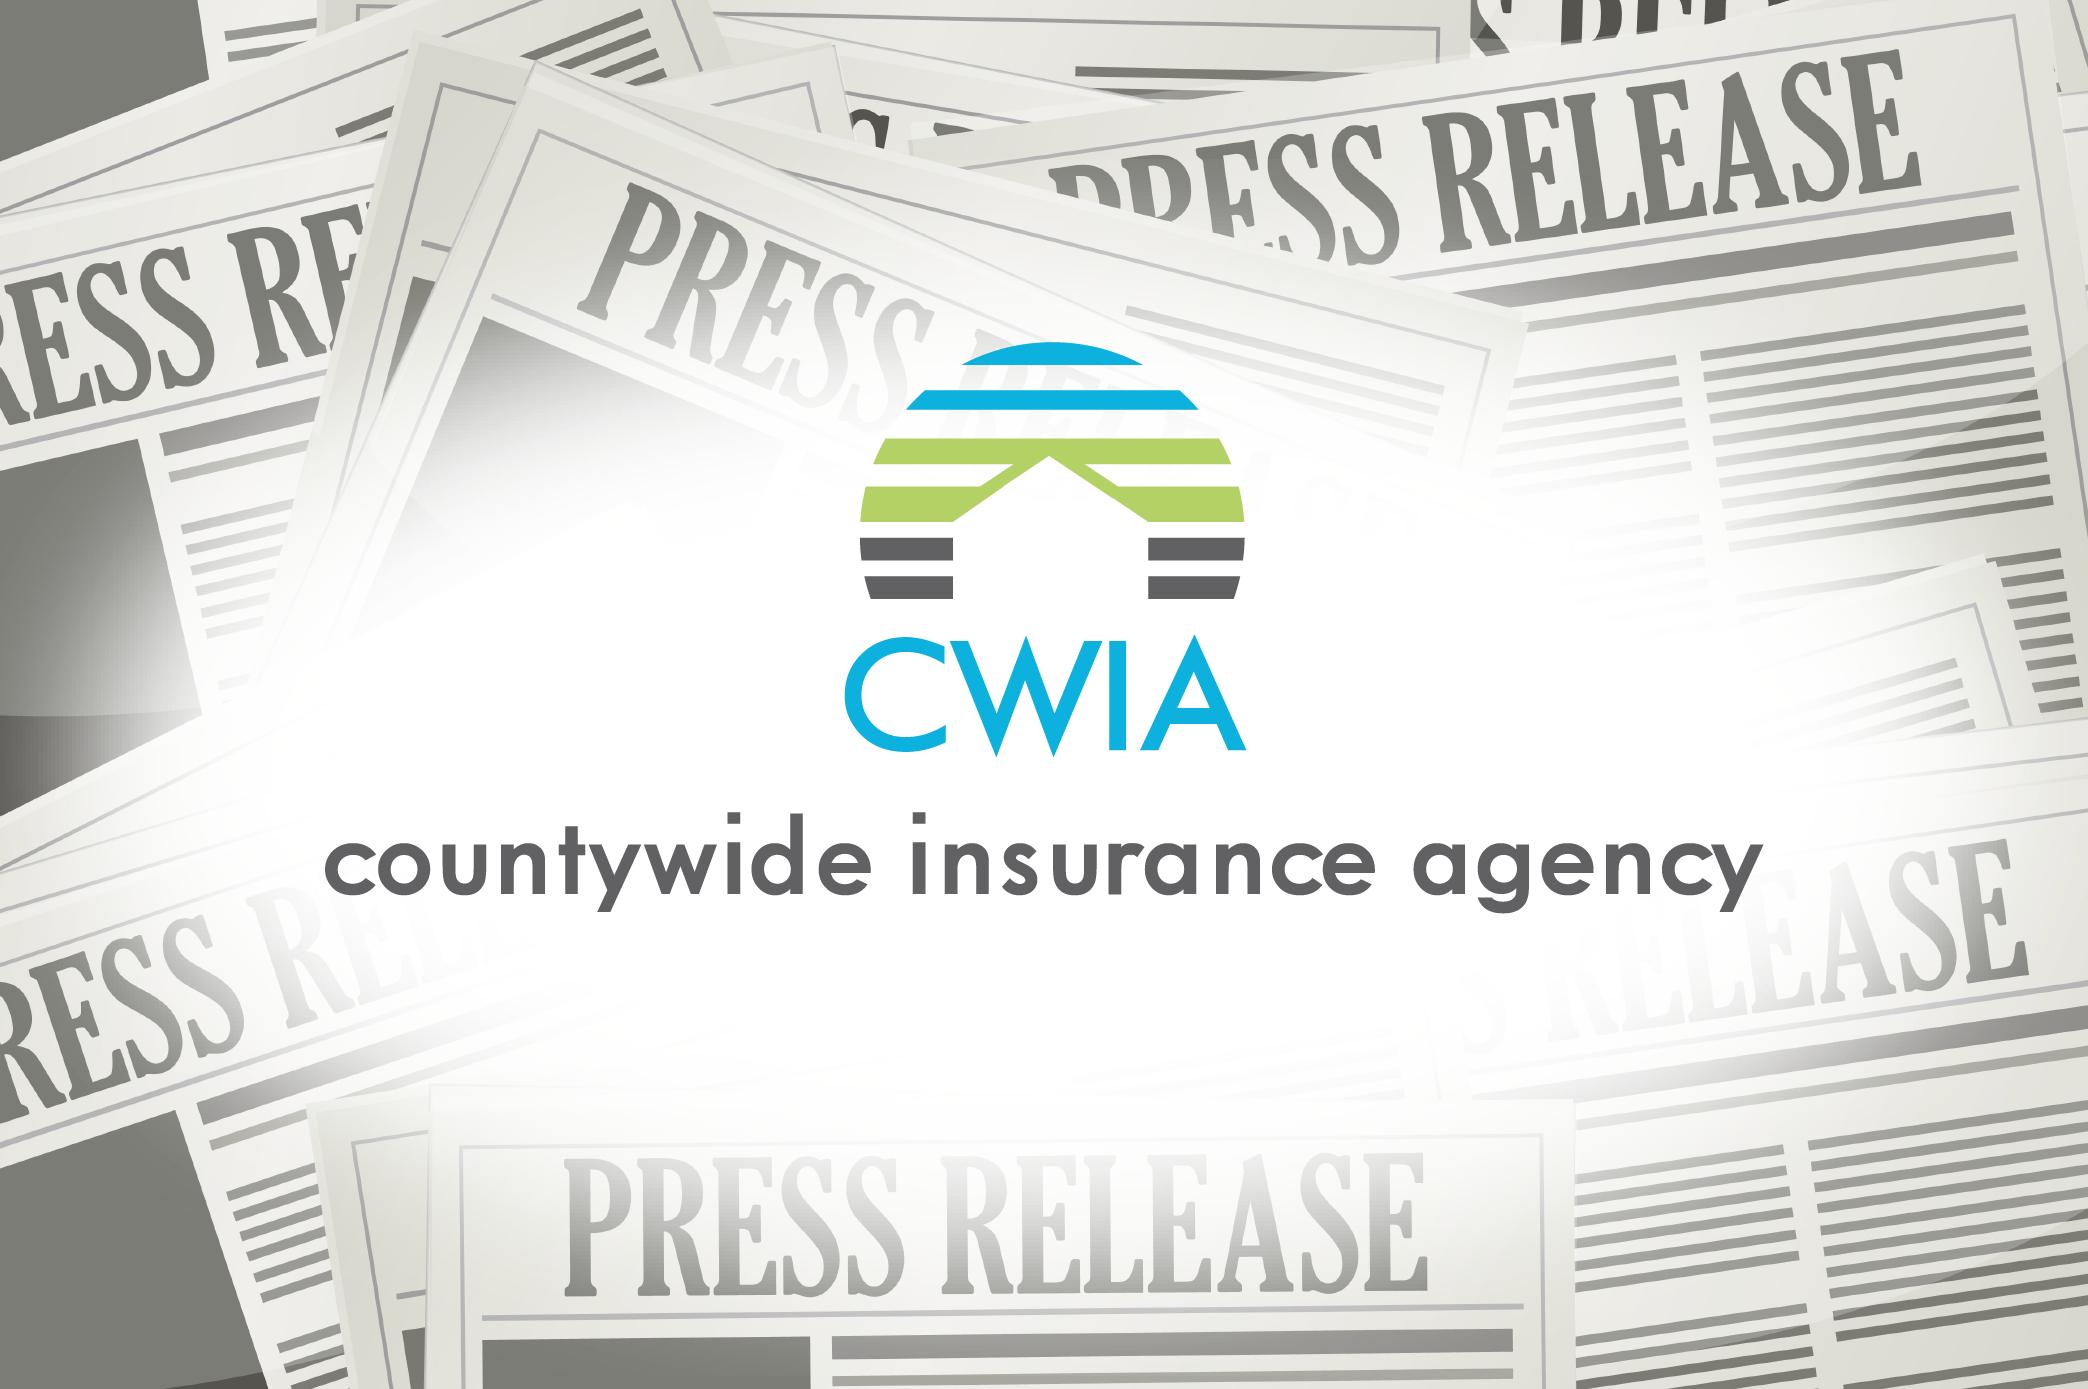 CWIA - Countywide Insurance Agency